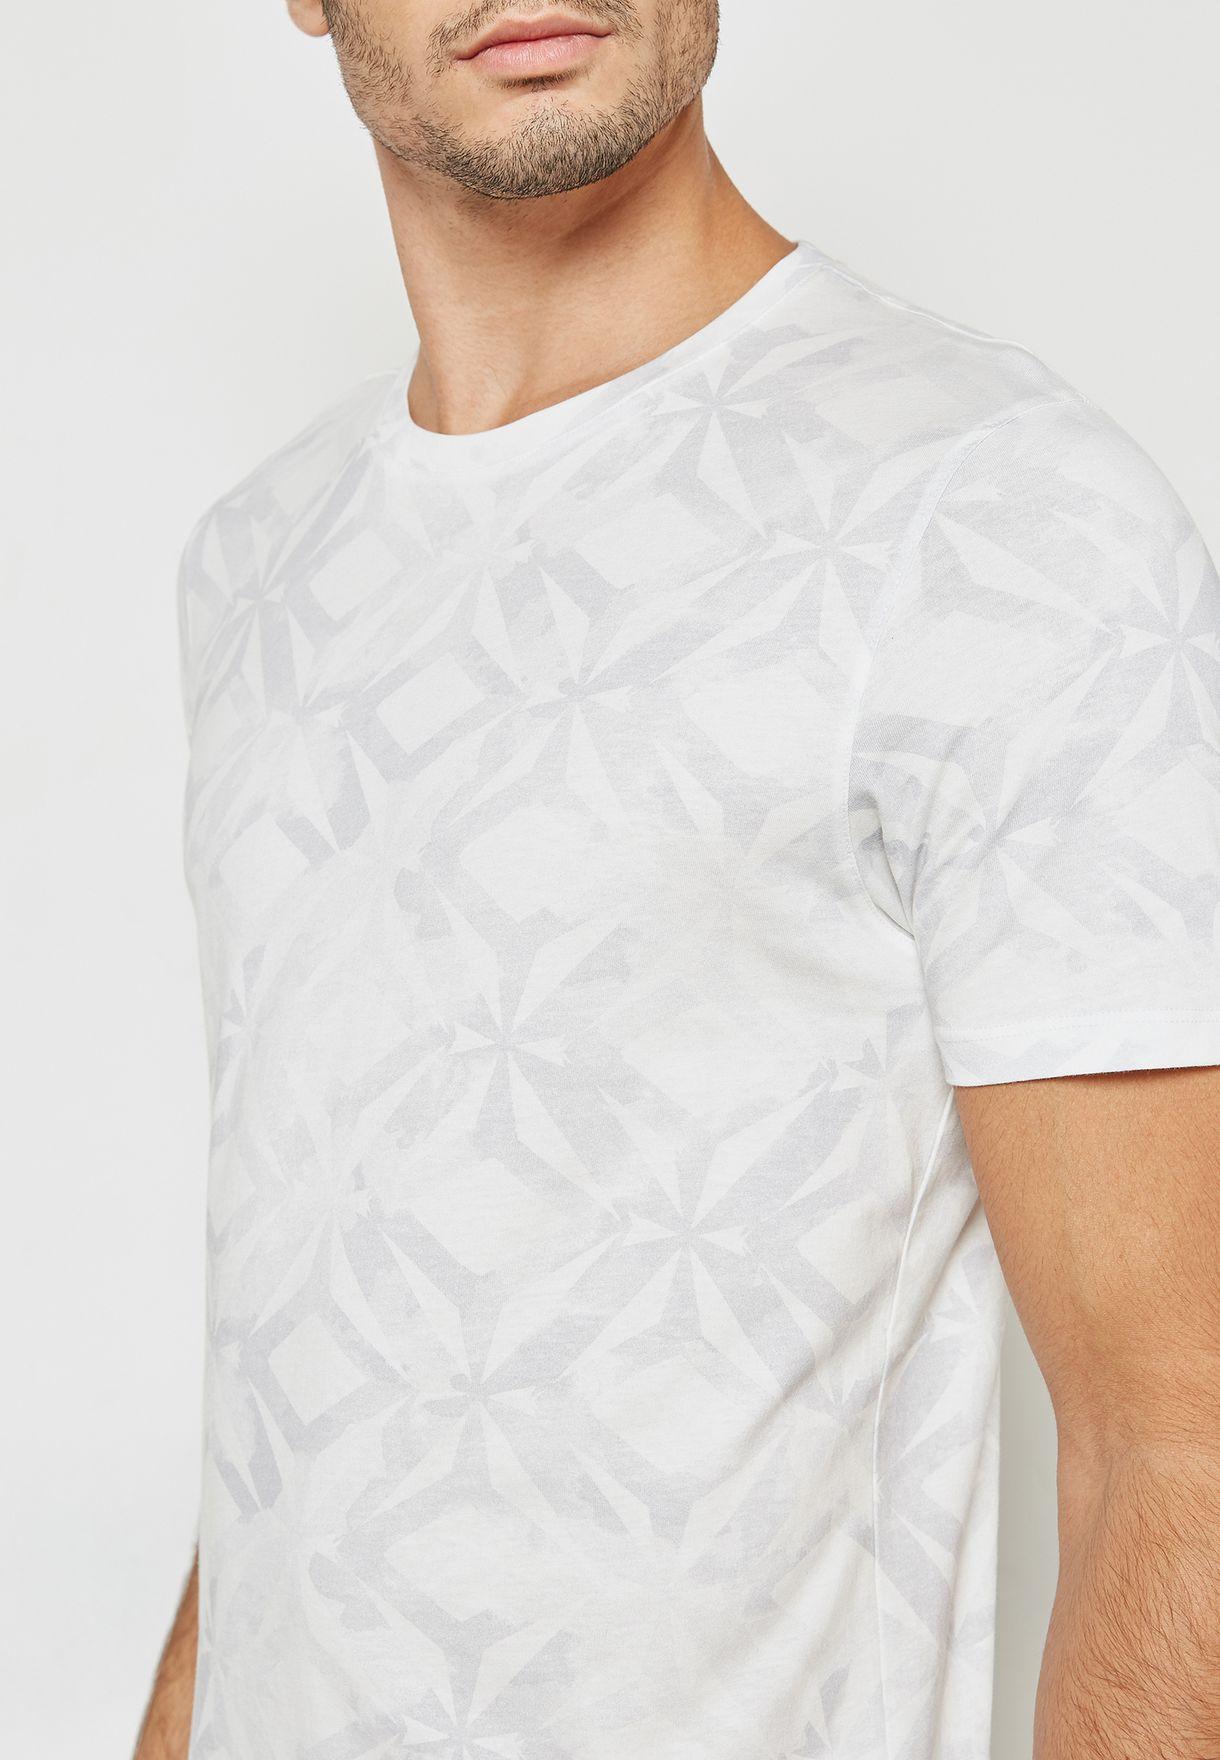 d26f8d915fae9f Shop Ted baker prints Woof Geo Print T-Shirt 141493 for Men in Saudi ...